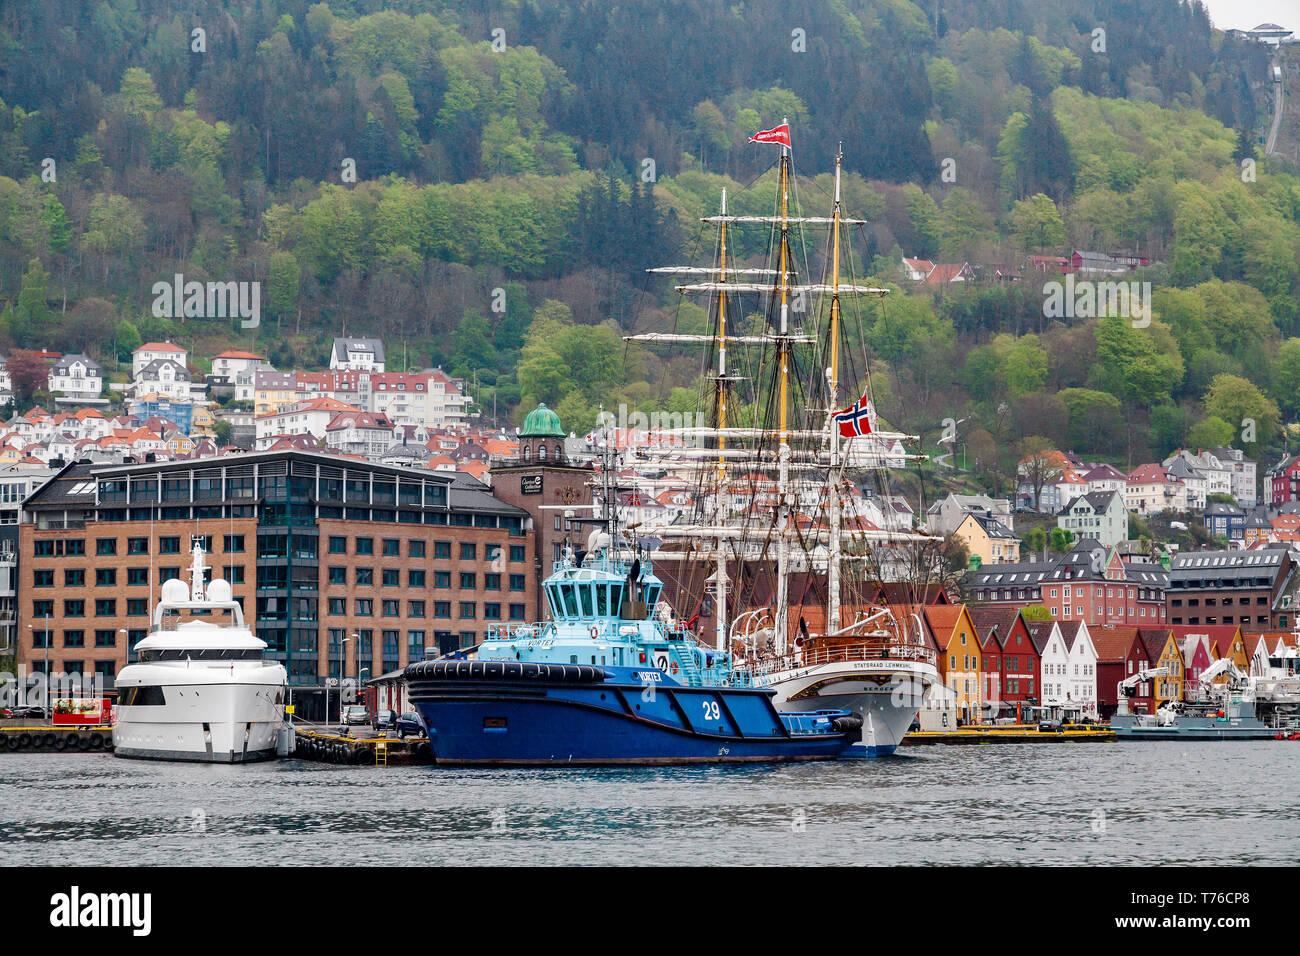 Tug boat Vortex at Bradbenken terminal in the port of Bergen, Norway. Tall ship Statsraad Lehmkuhl and super yacht Najiba in background. - Stock Image